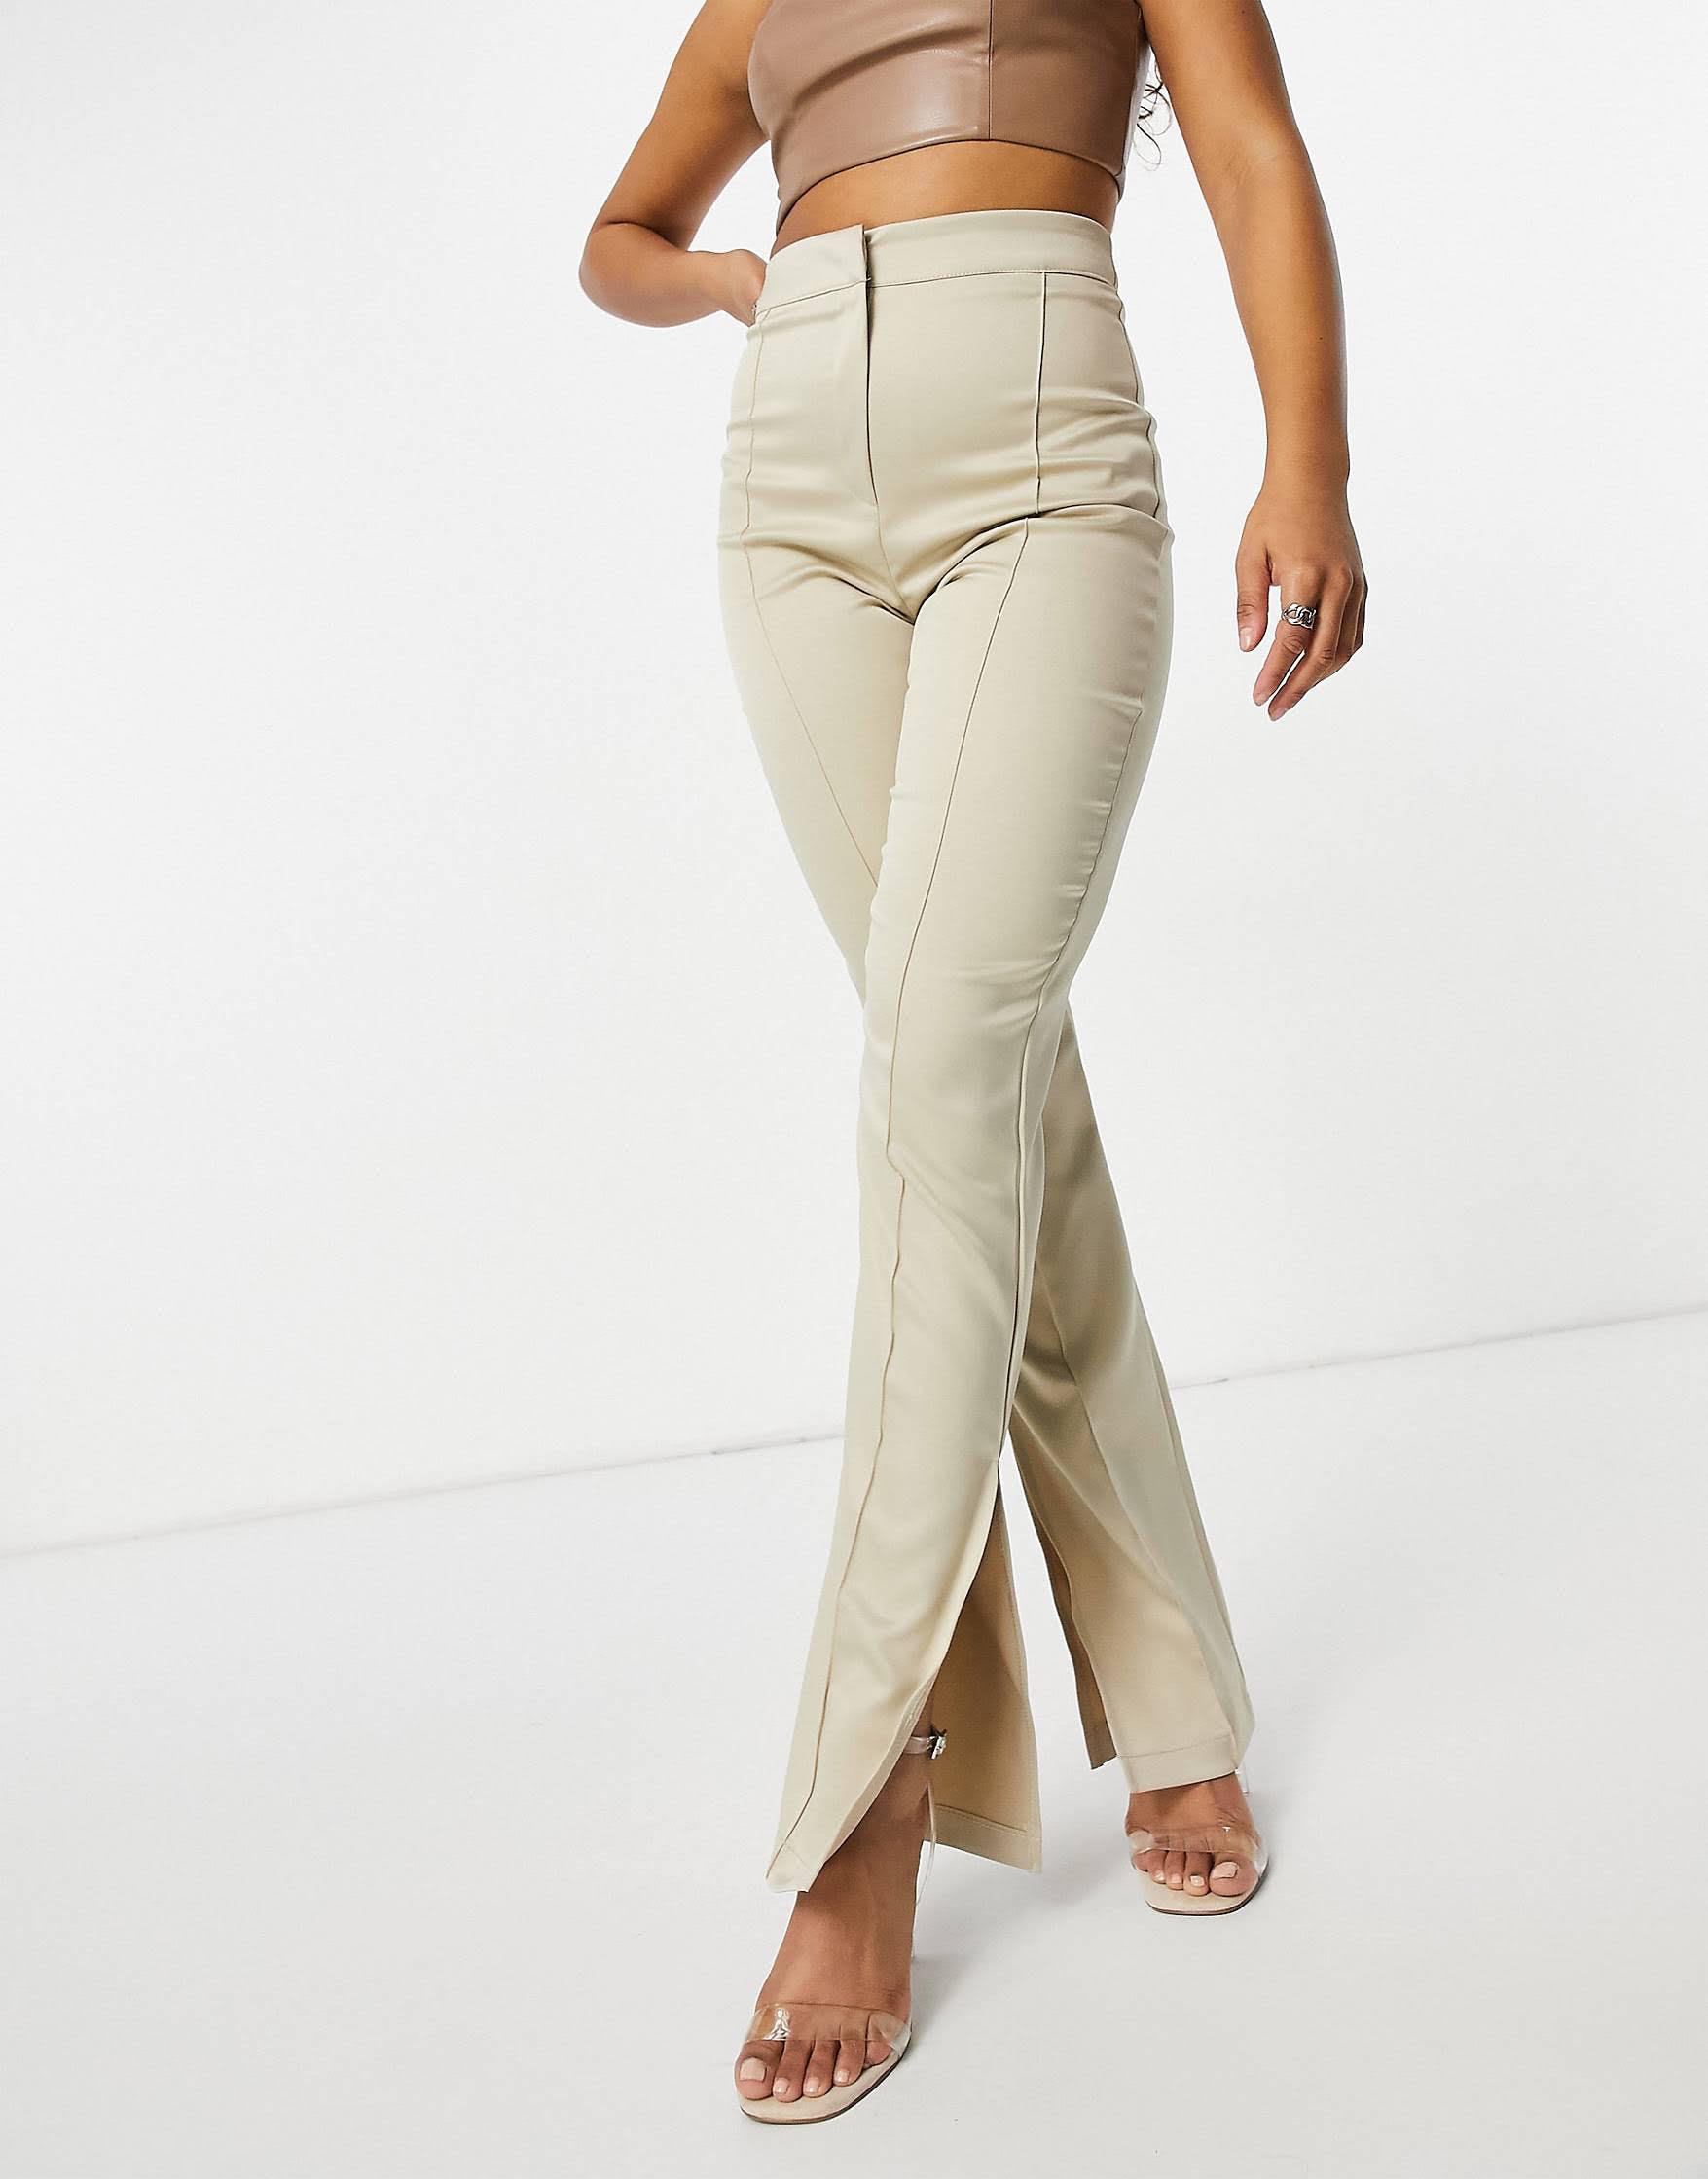 Pantalones color crema con abertura lateral de satén de Femme Luxe